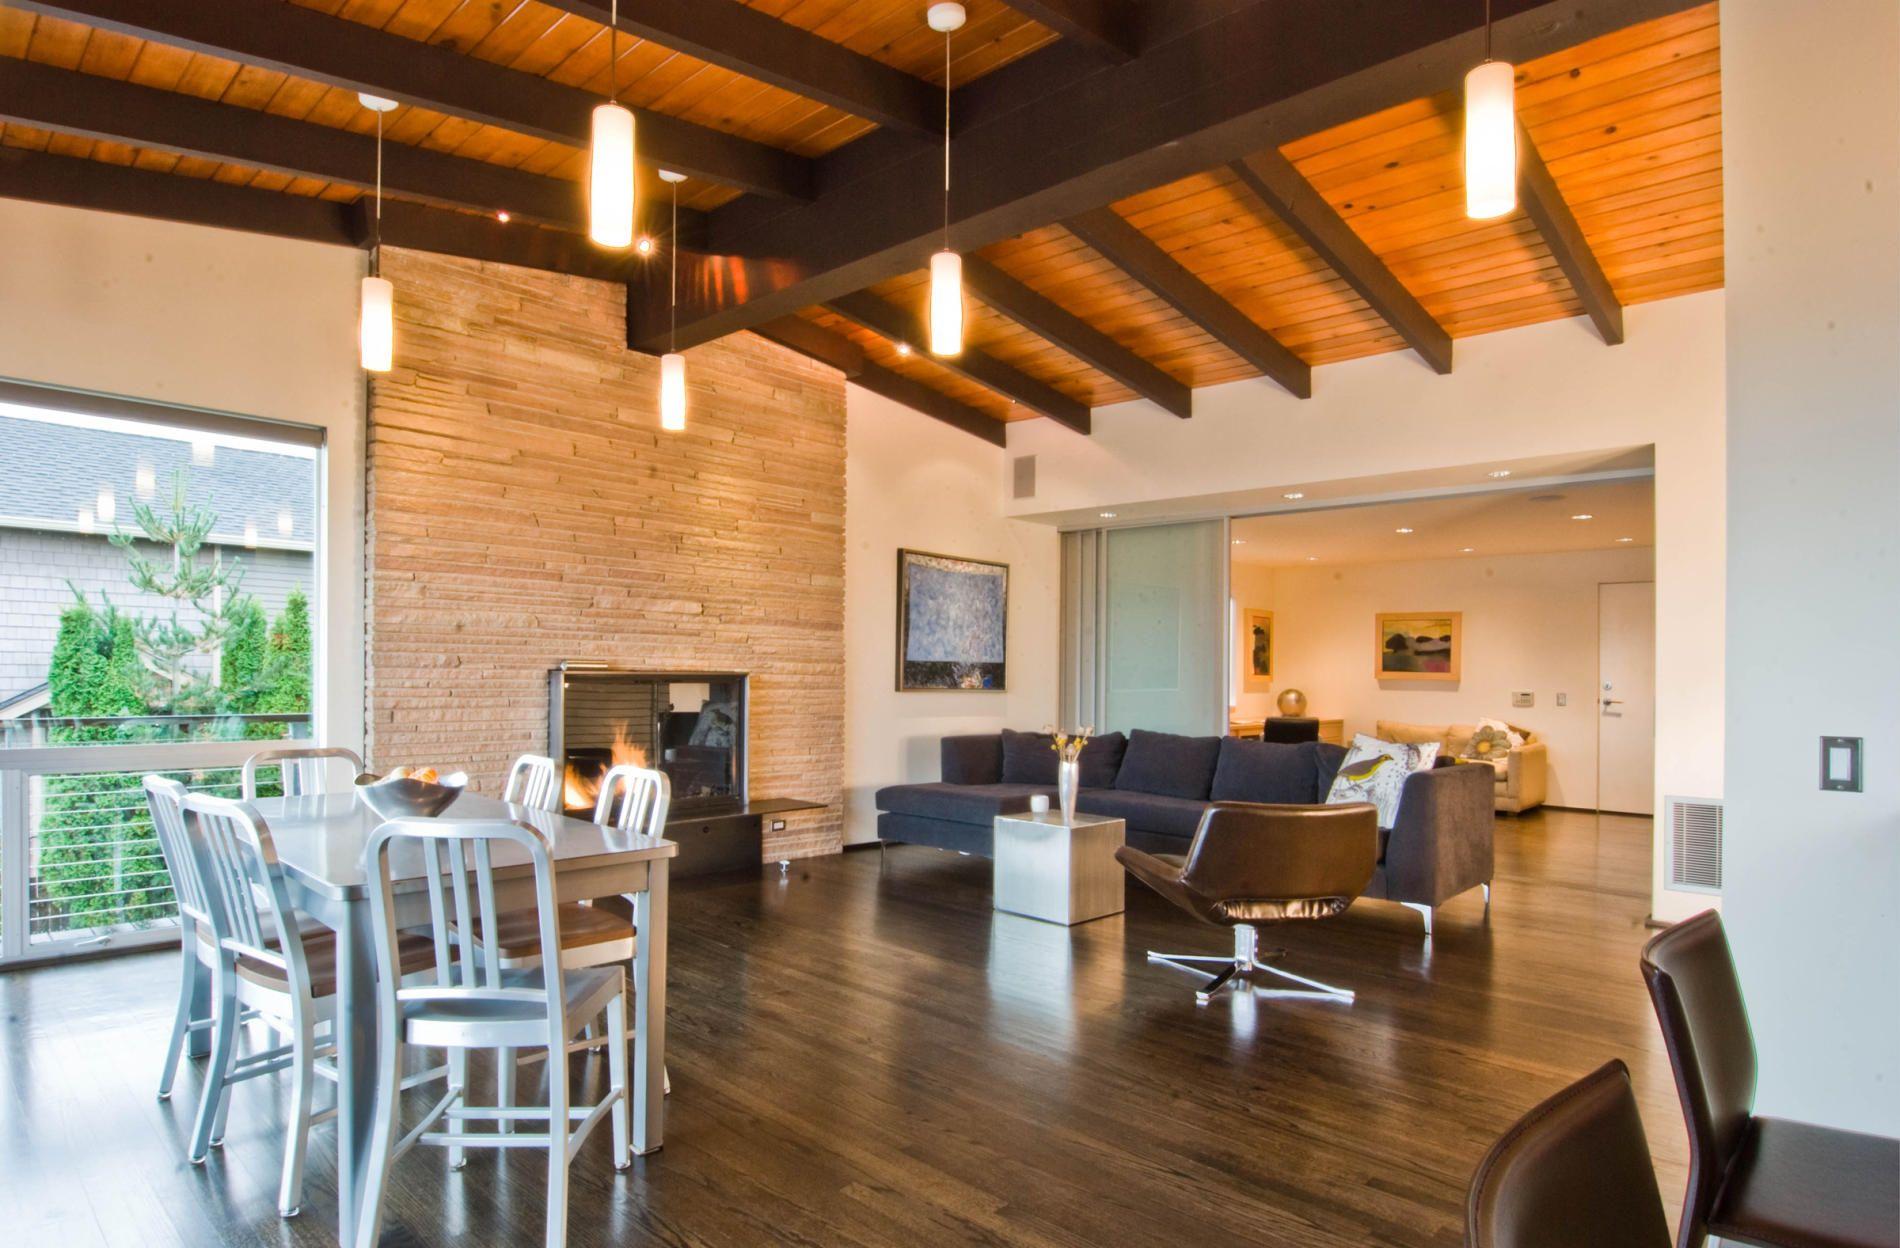 breathtaking mid century modern kitchen design. So  here are some midcentury modern living room designs for you 21 Beautiful Mid Century Modern Living Room Ideas century